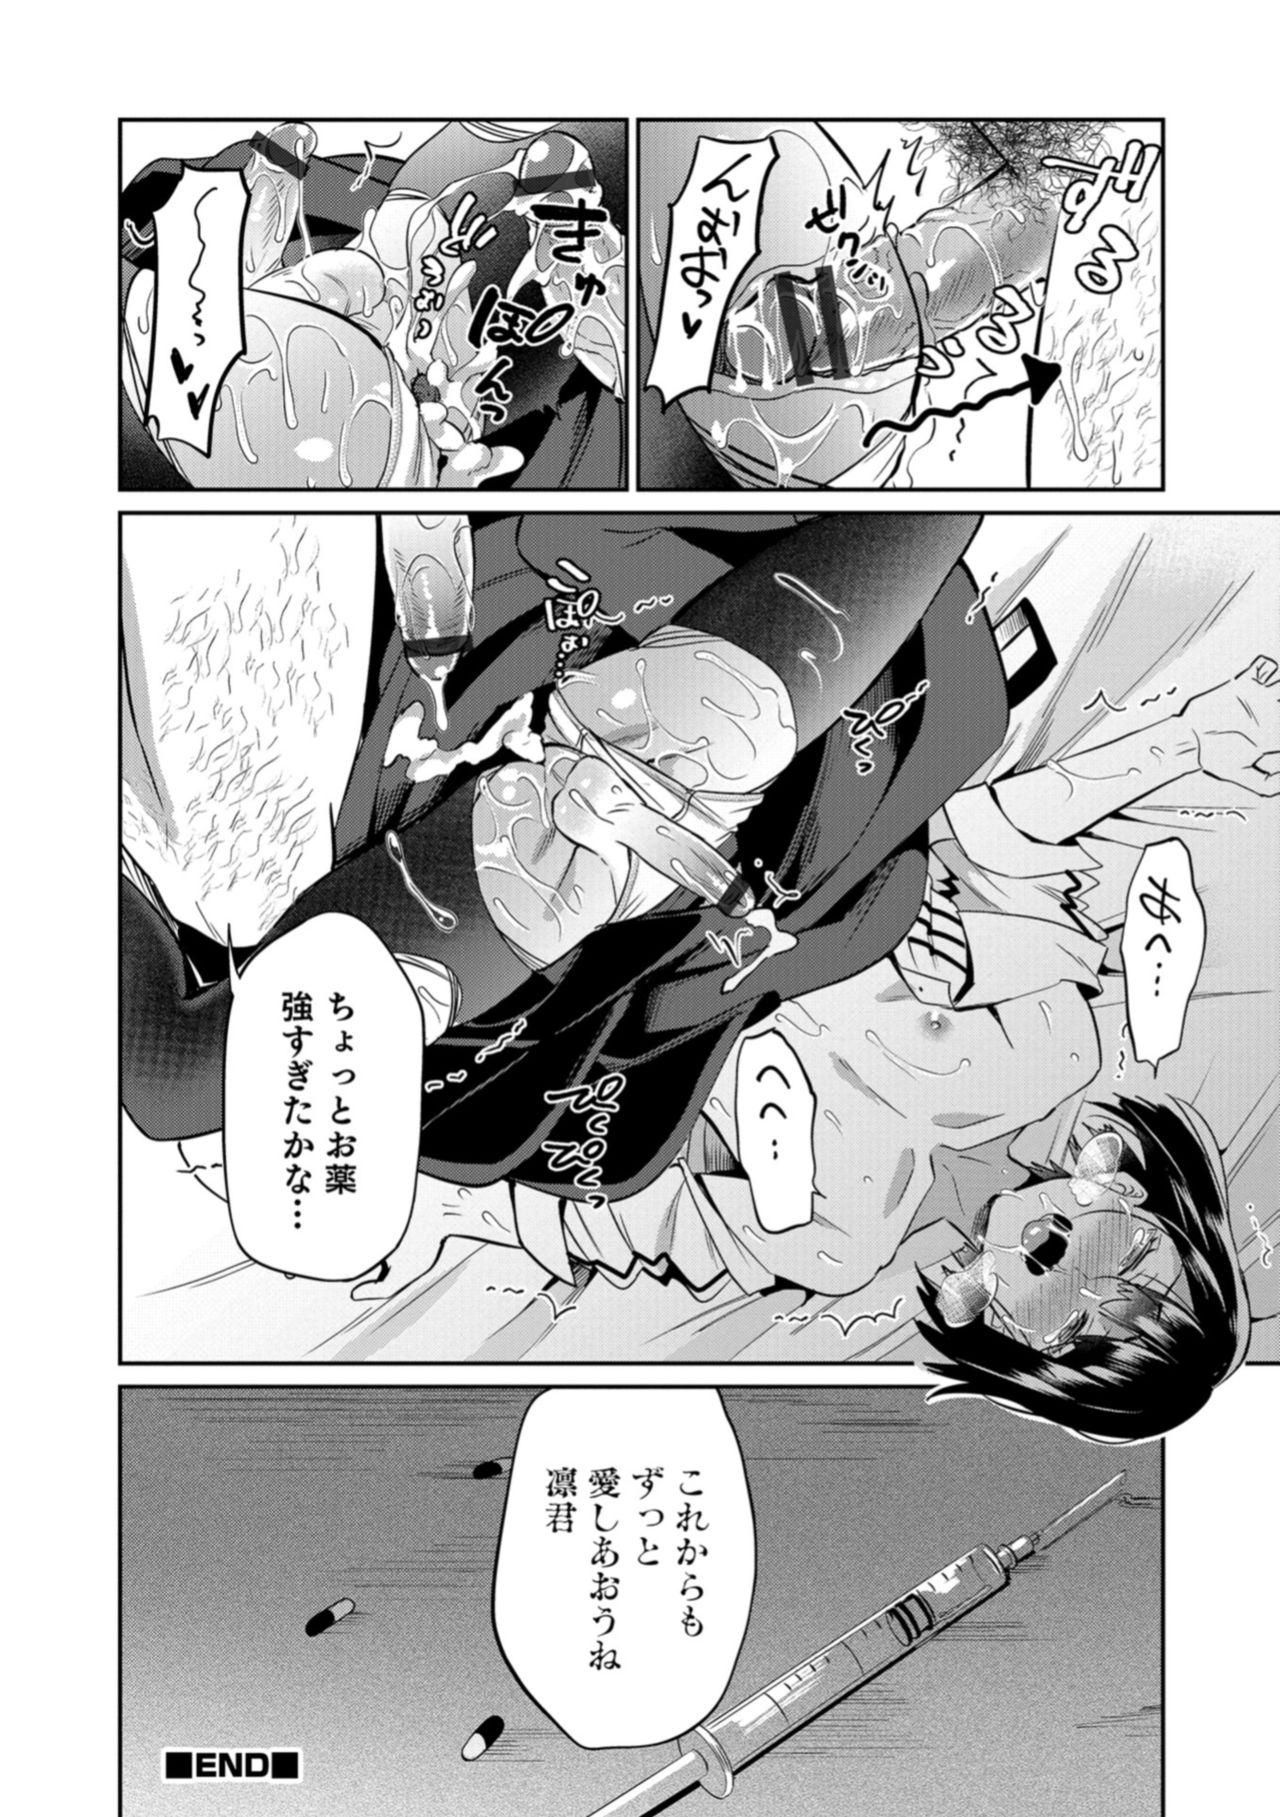 Otokonoko HELL'S GATE #03 19